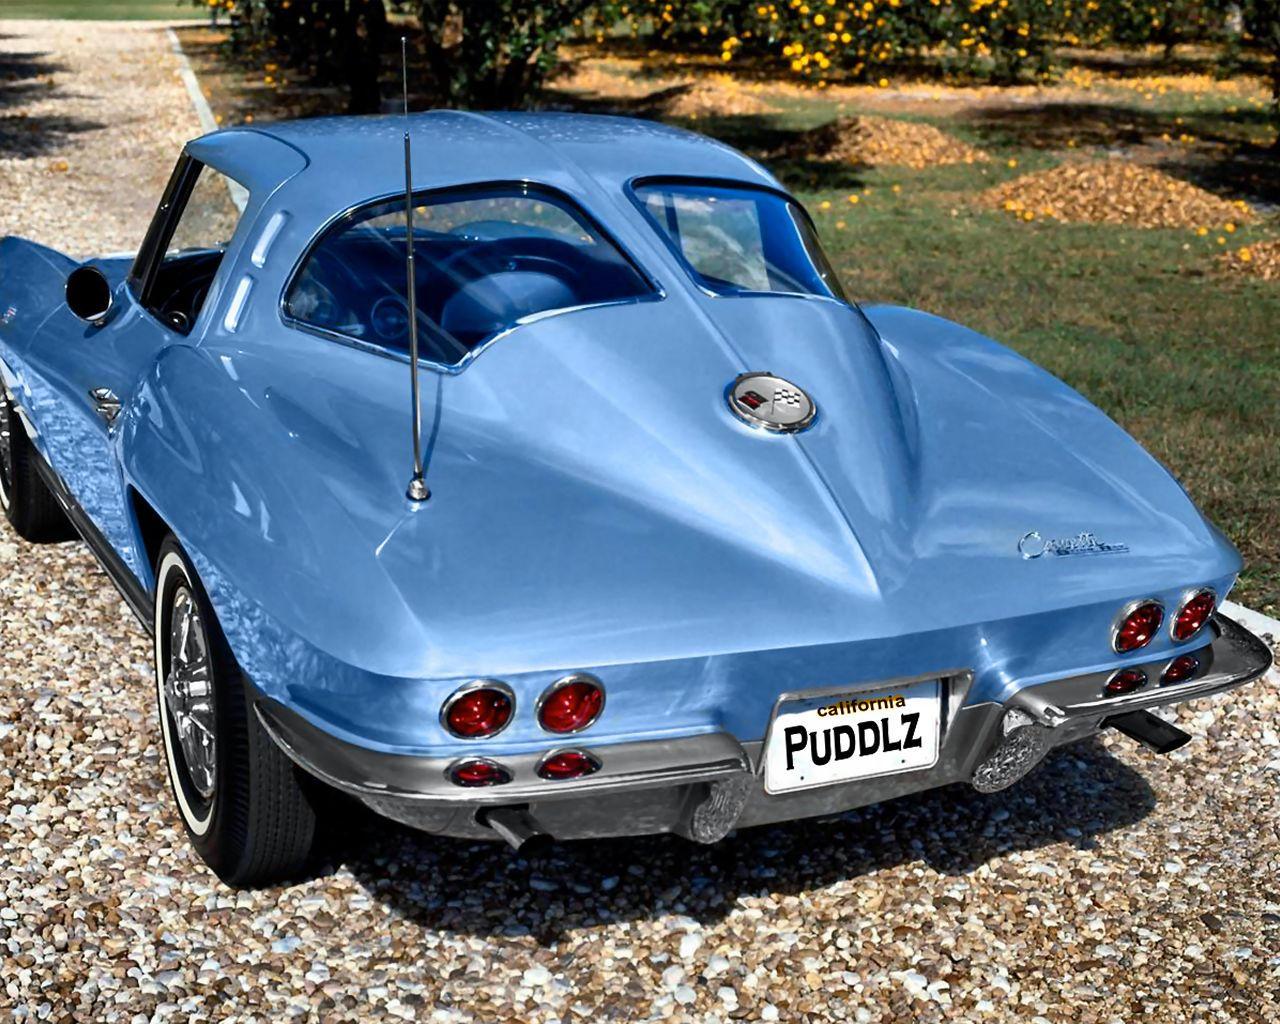 63 split window corvette fuelie for sale autos post for 1963 corvette split window fuelie sale